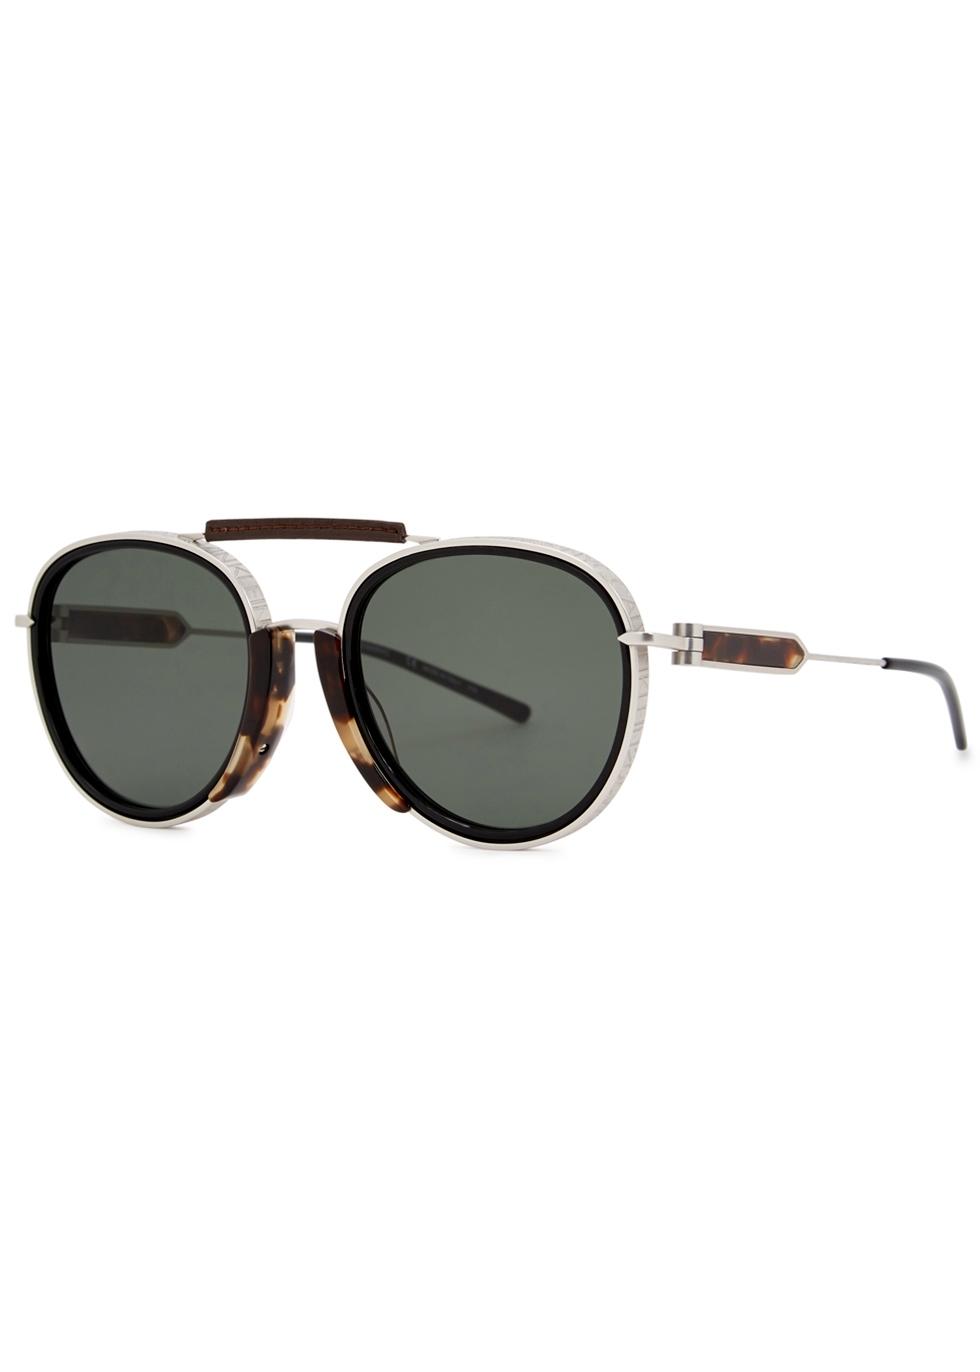 e2a5a89b081a Men s Designer Sunglasses   Eyewear - Harvey Nichols